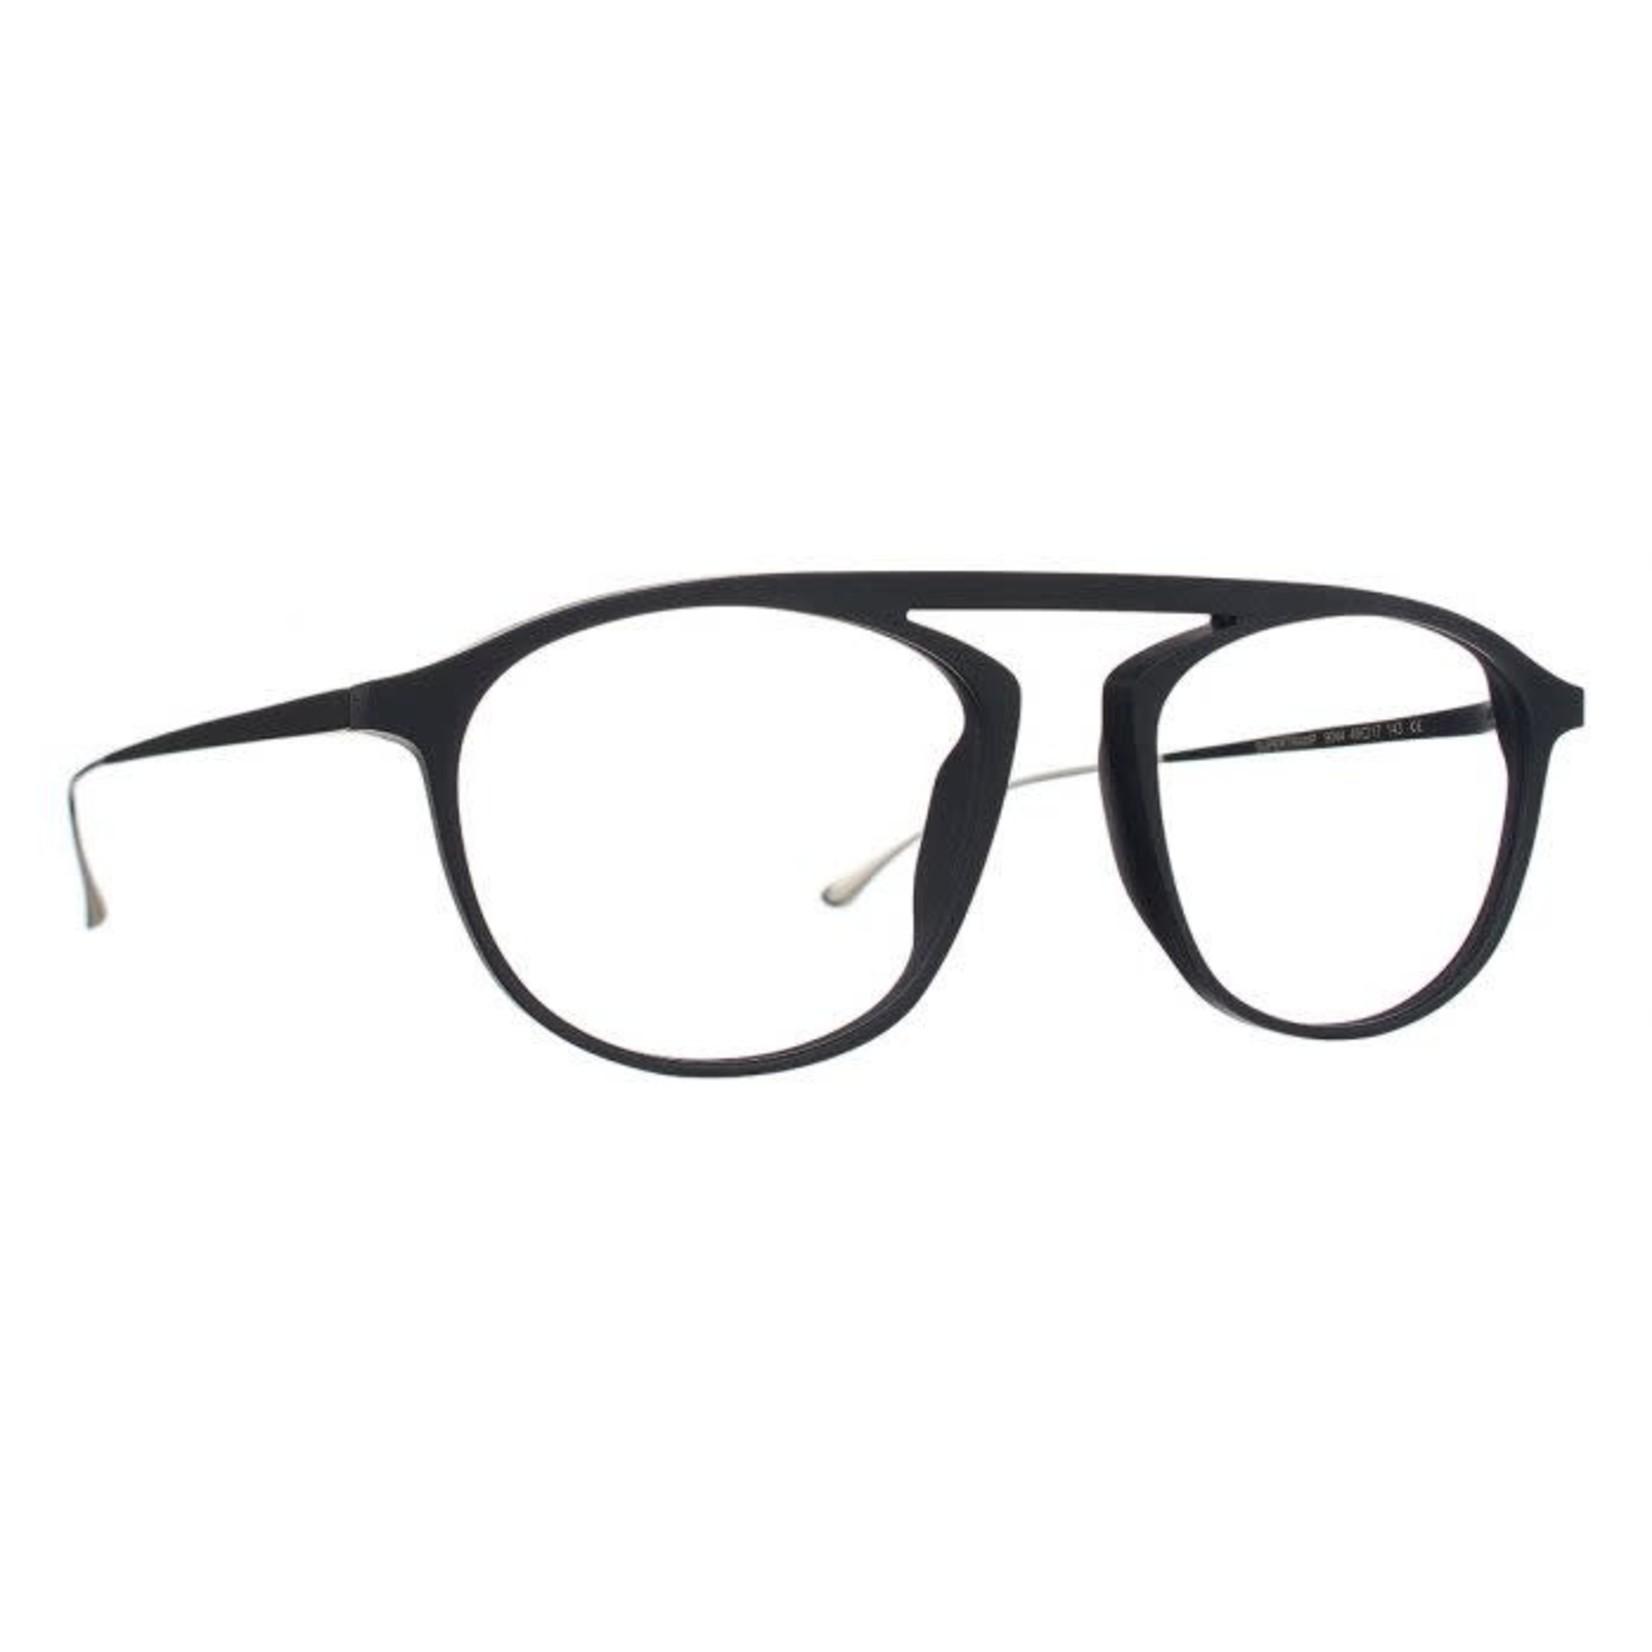 Talla Eyewear Talla Supertramp